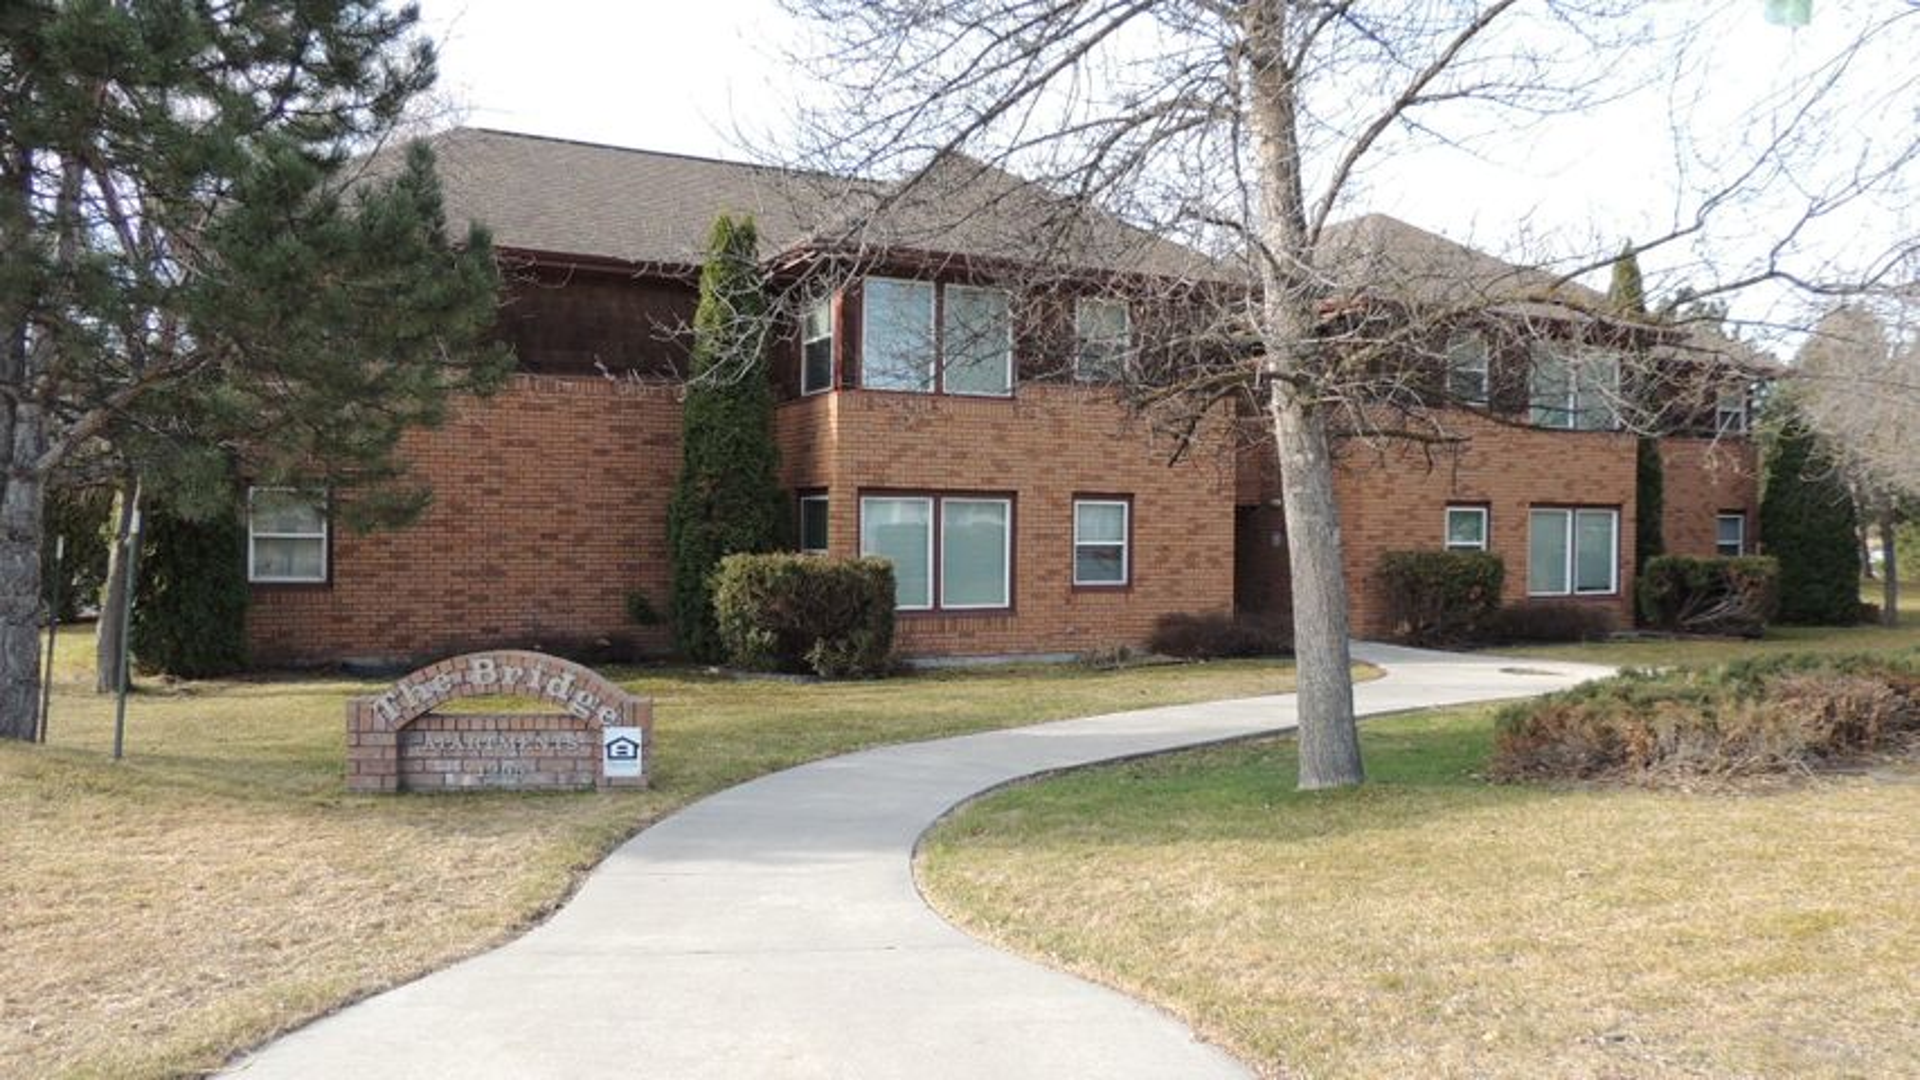 1205 West Broadway Street, Missoula, MT 59802